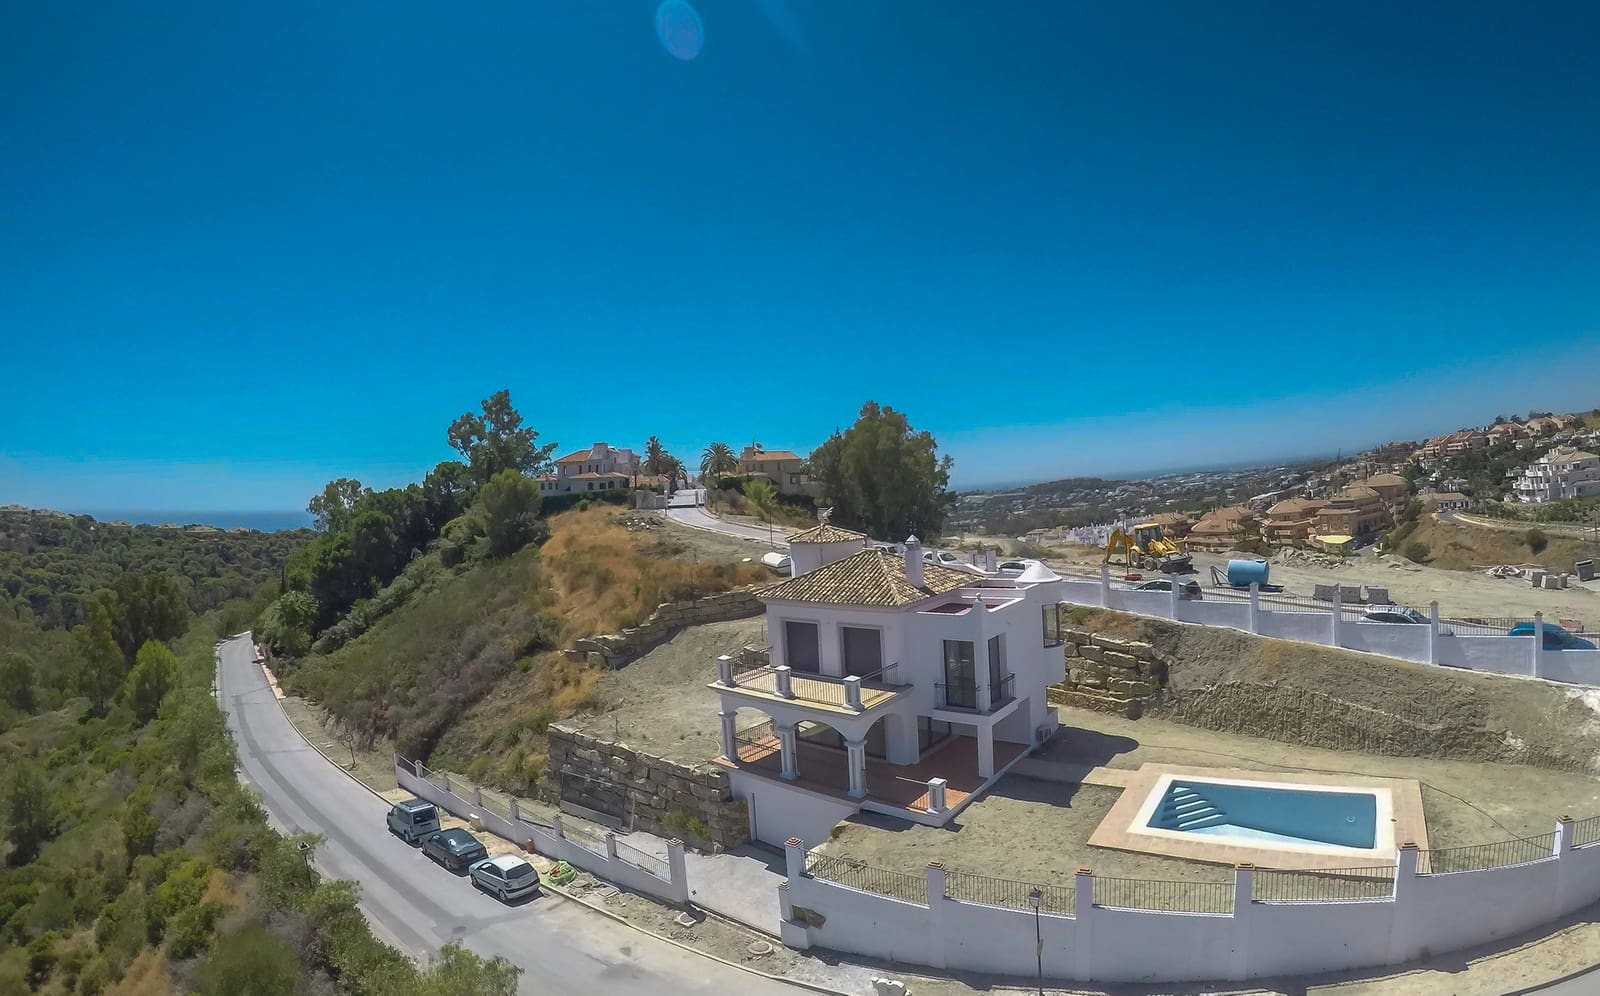 3 bedroom Villa for sale in Marbella with pool garage - € 690,000 (Ref: 4168881)